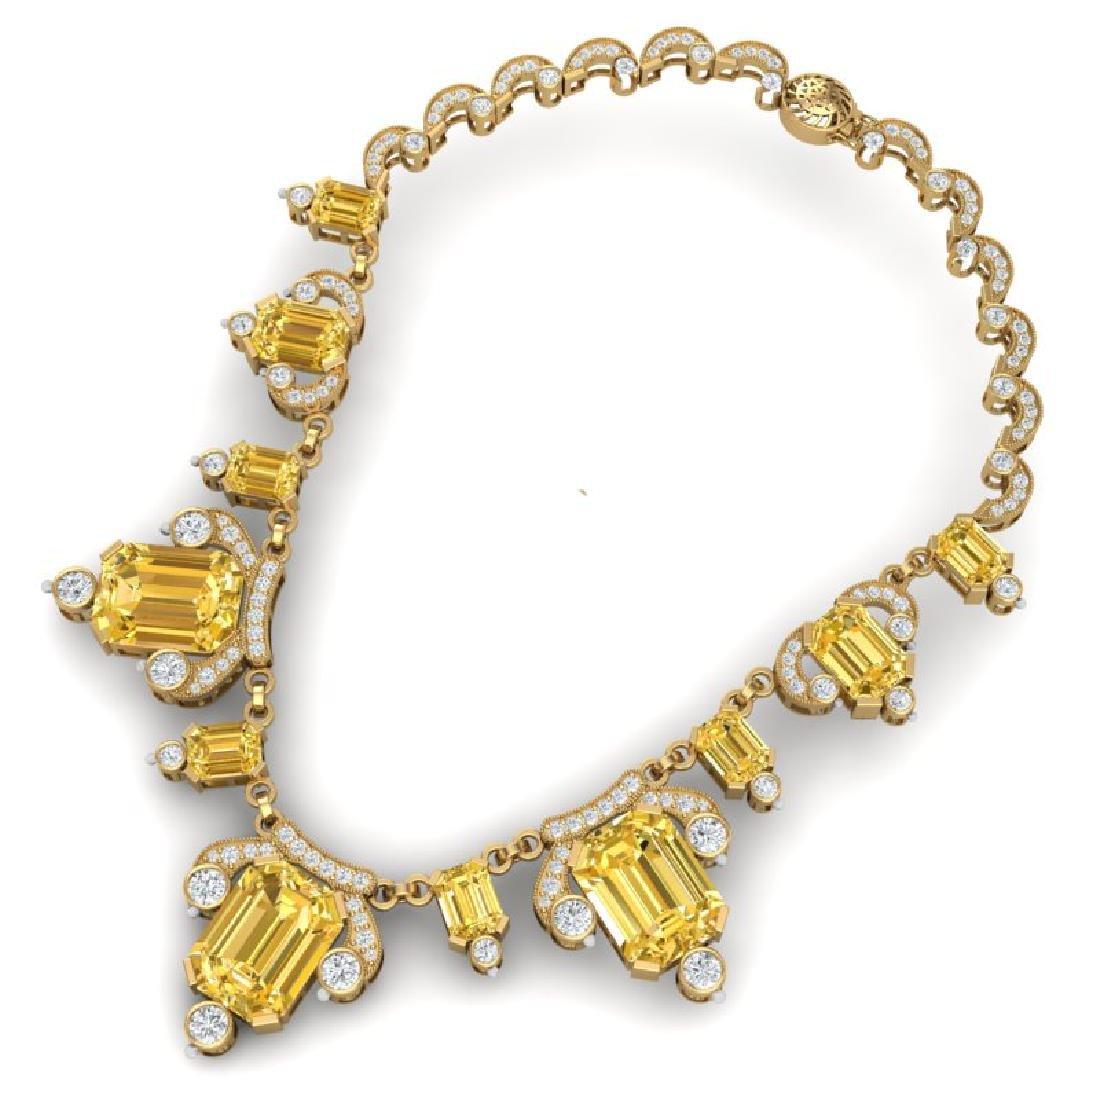 71.48 CTW Royalty Canary Citrine & VS Diamond Necklace - 3